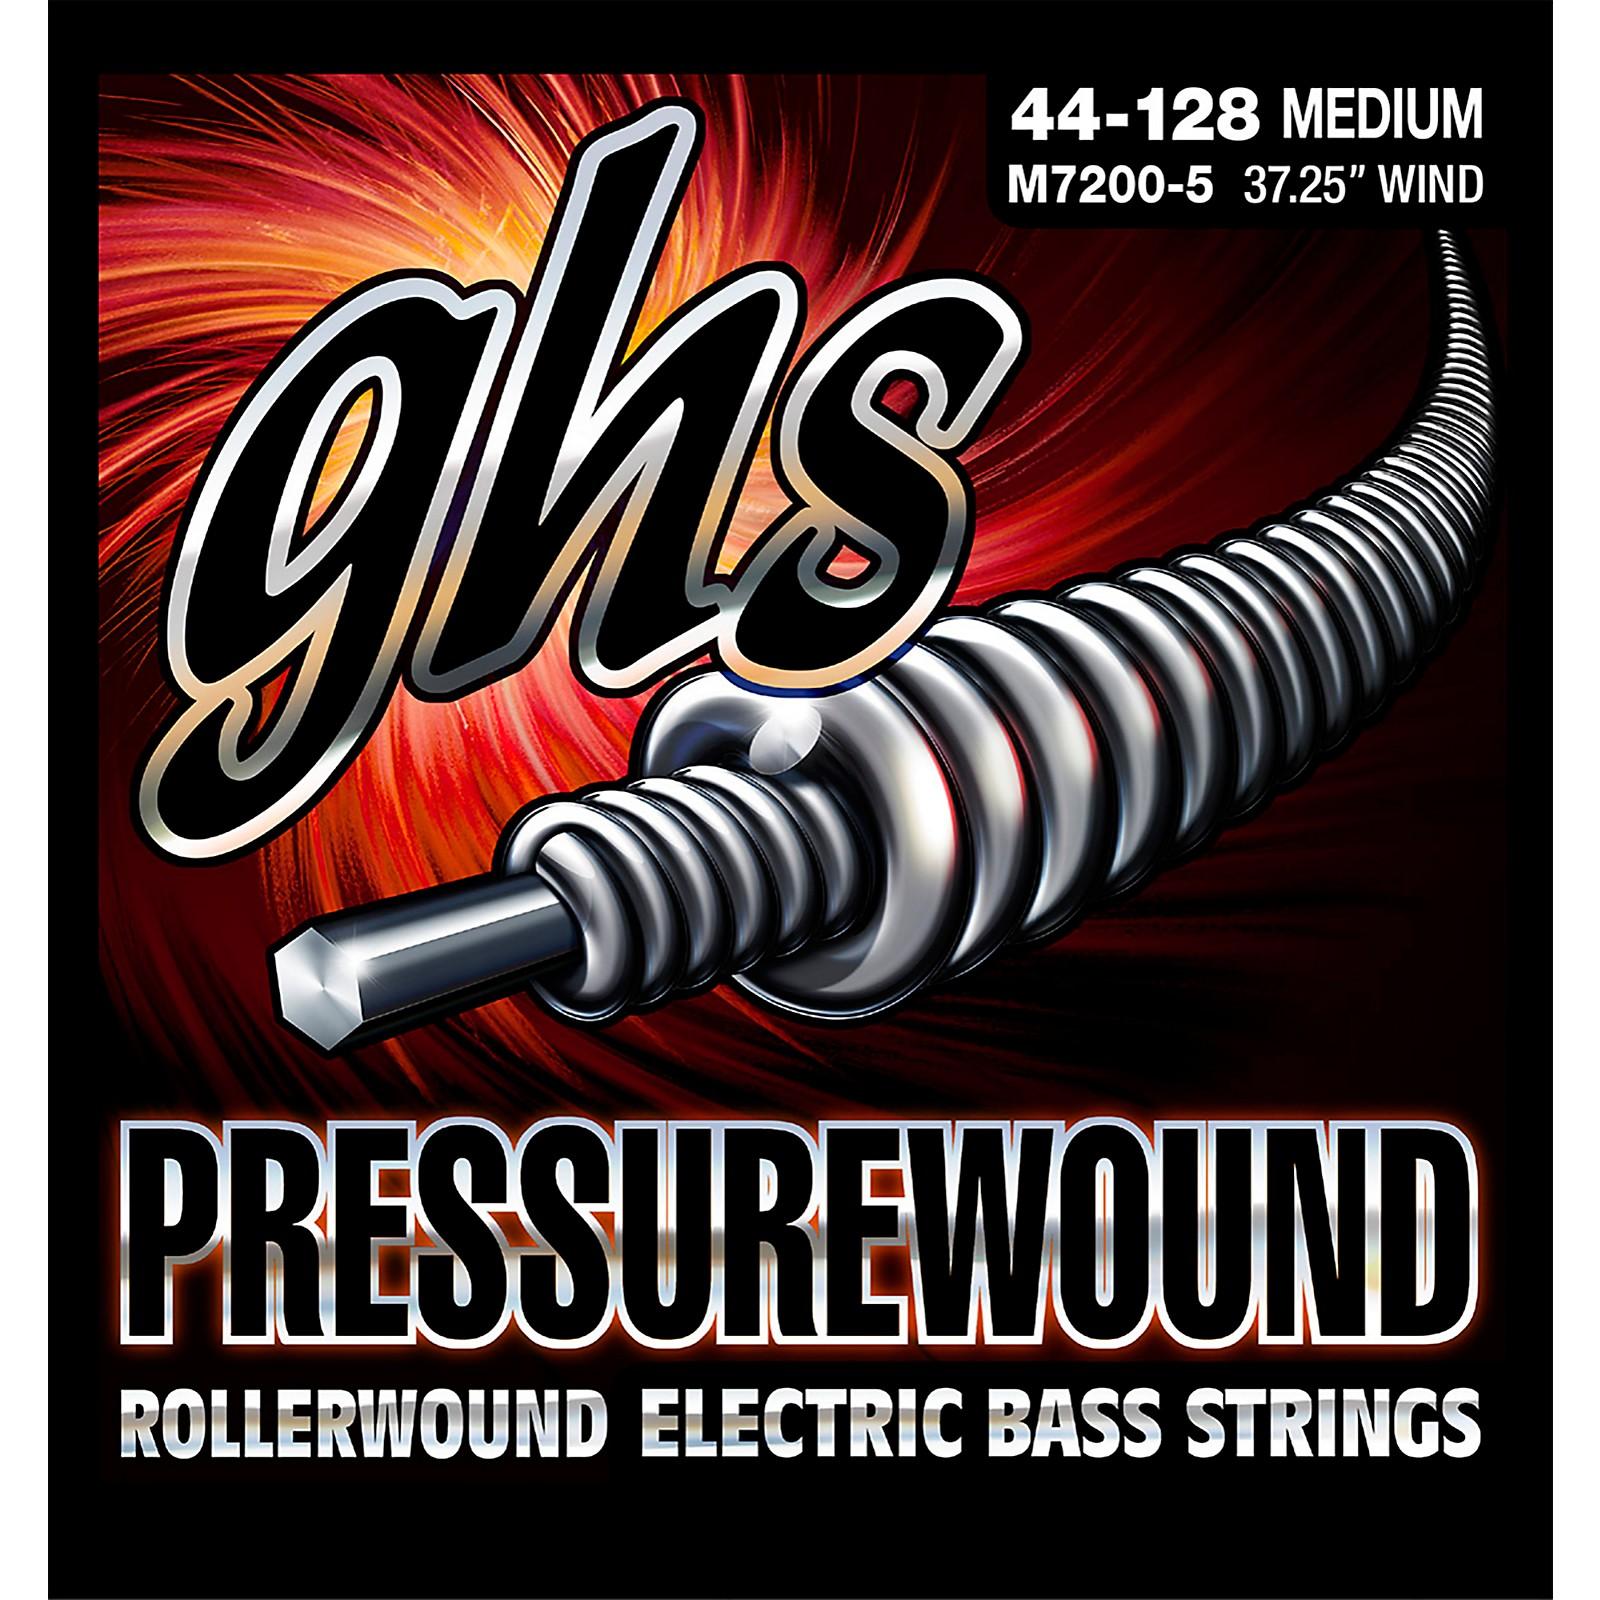 GHS Pressurewound Rollerwound Electric Bass Strings Med 44-128